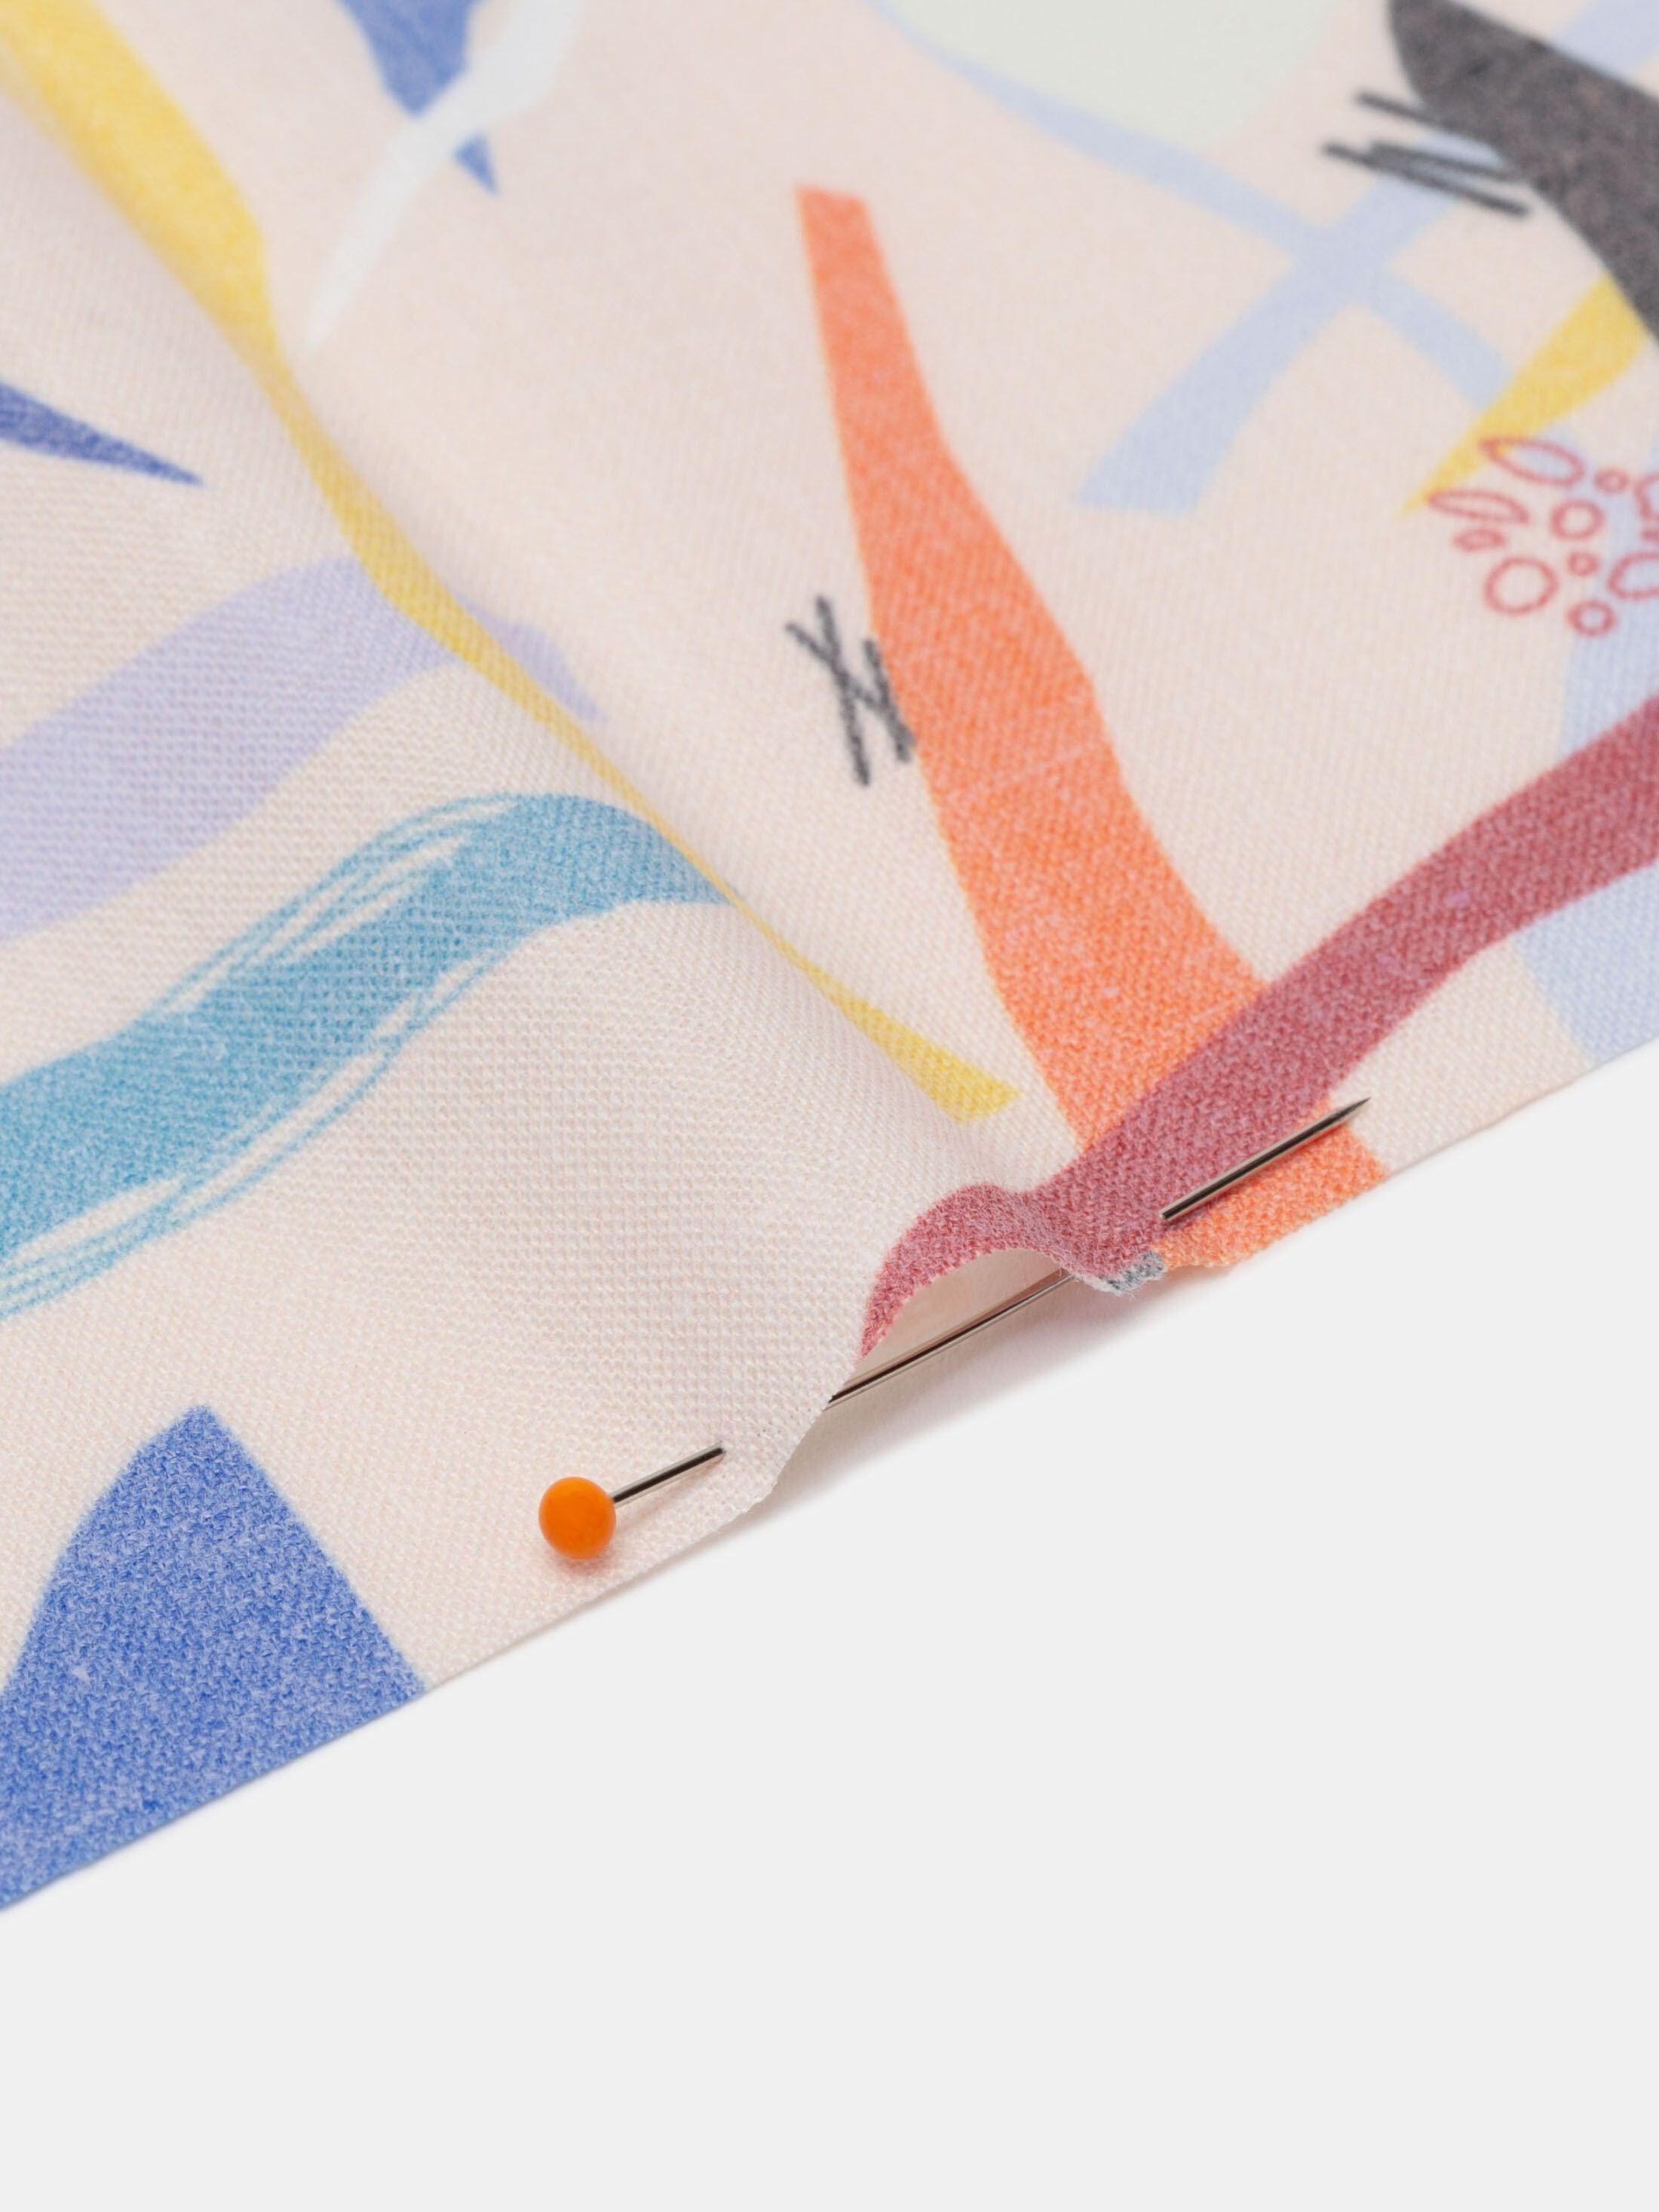 digital printing on vintage fade fabric demand edge options